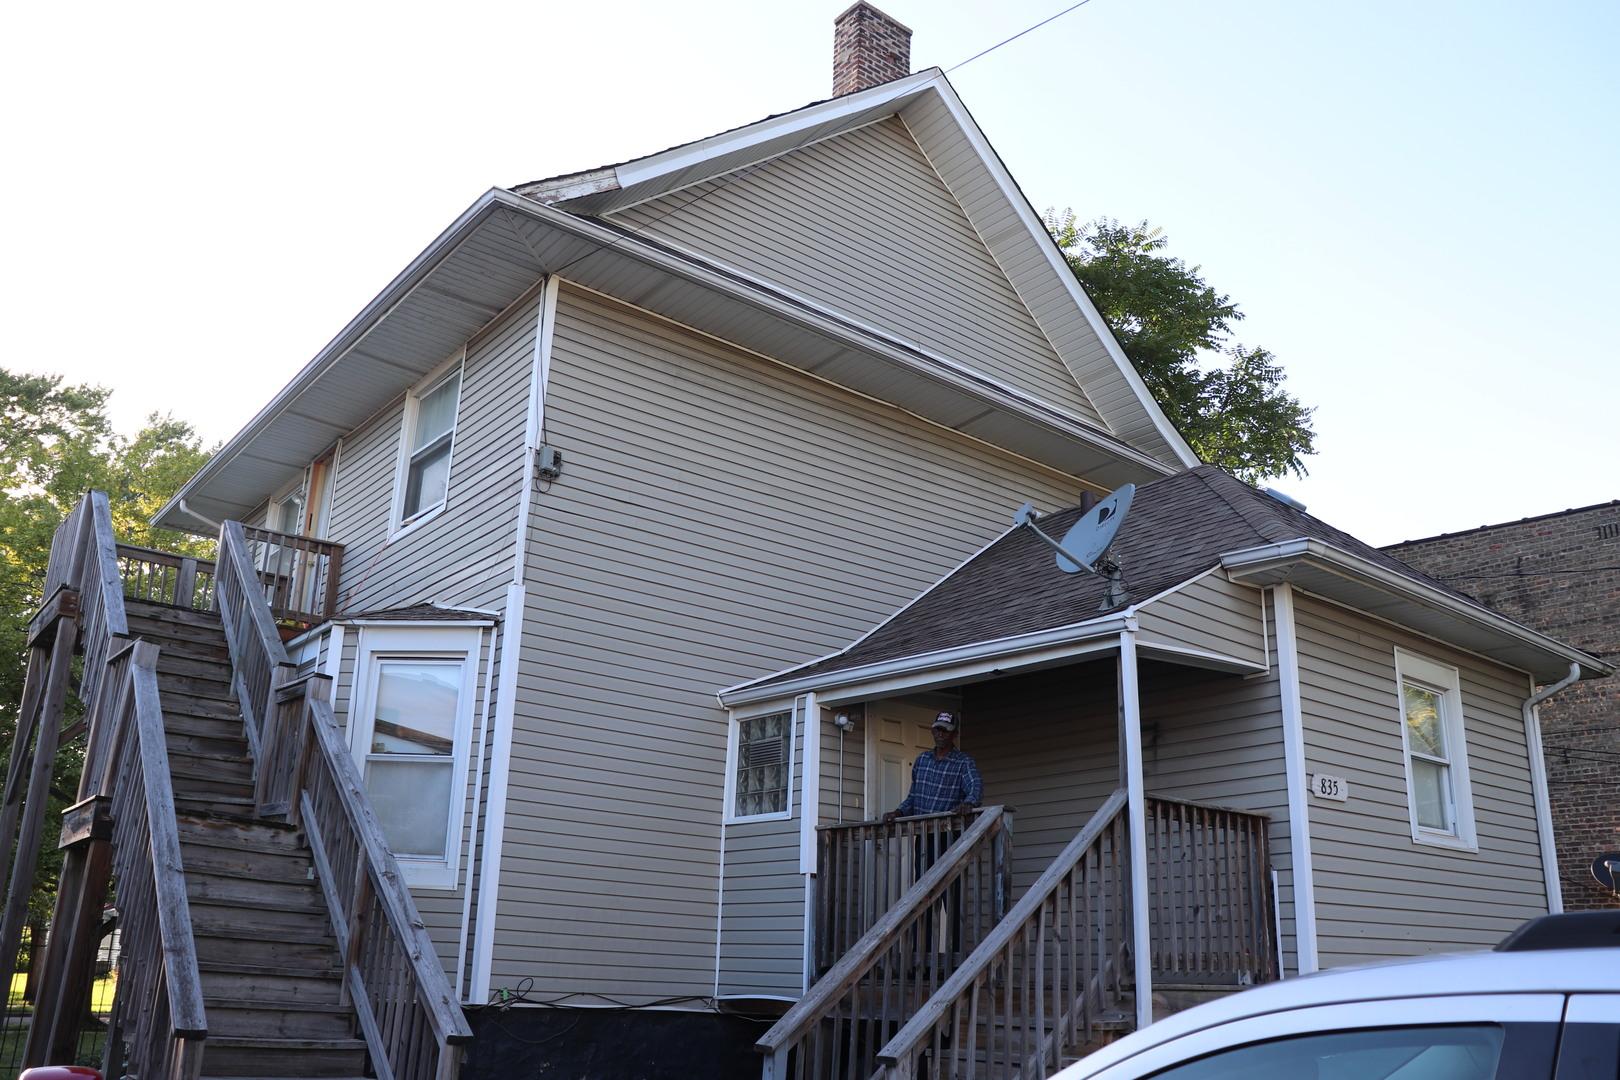 835 South 16th, Maywood, Illinois, 60153